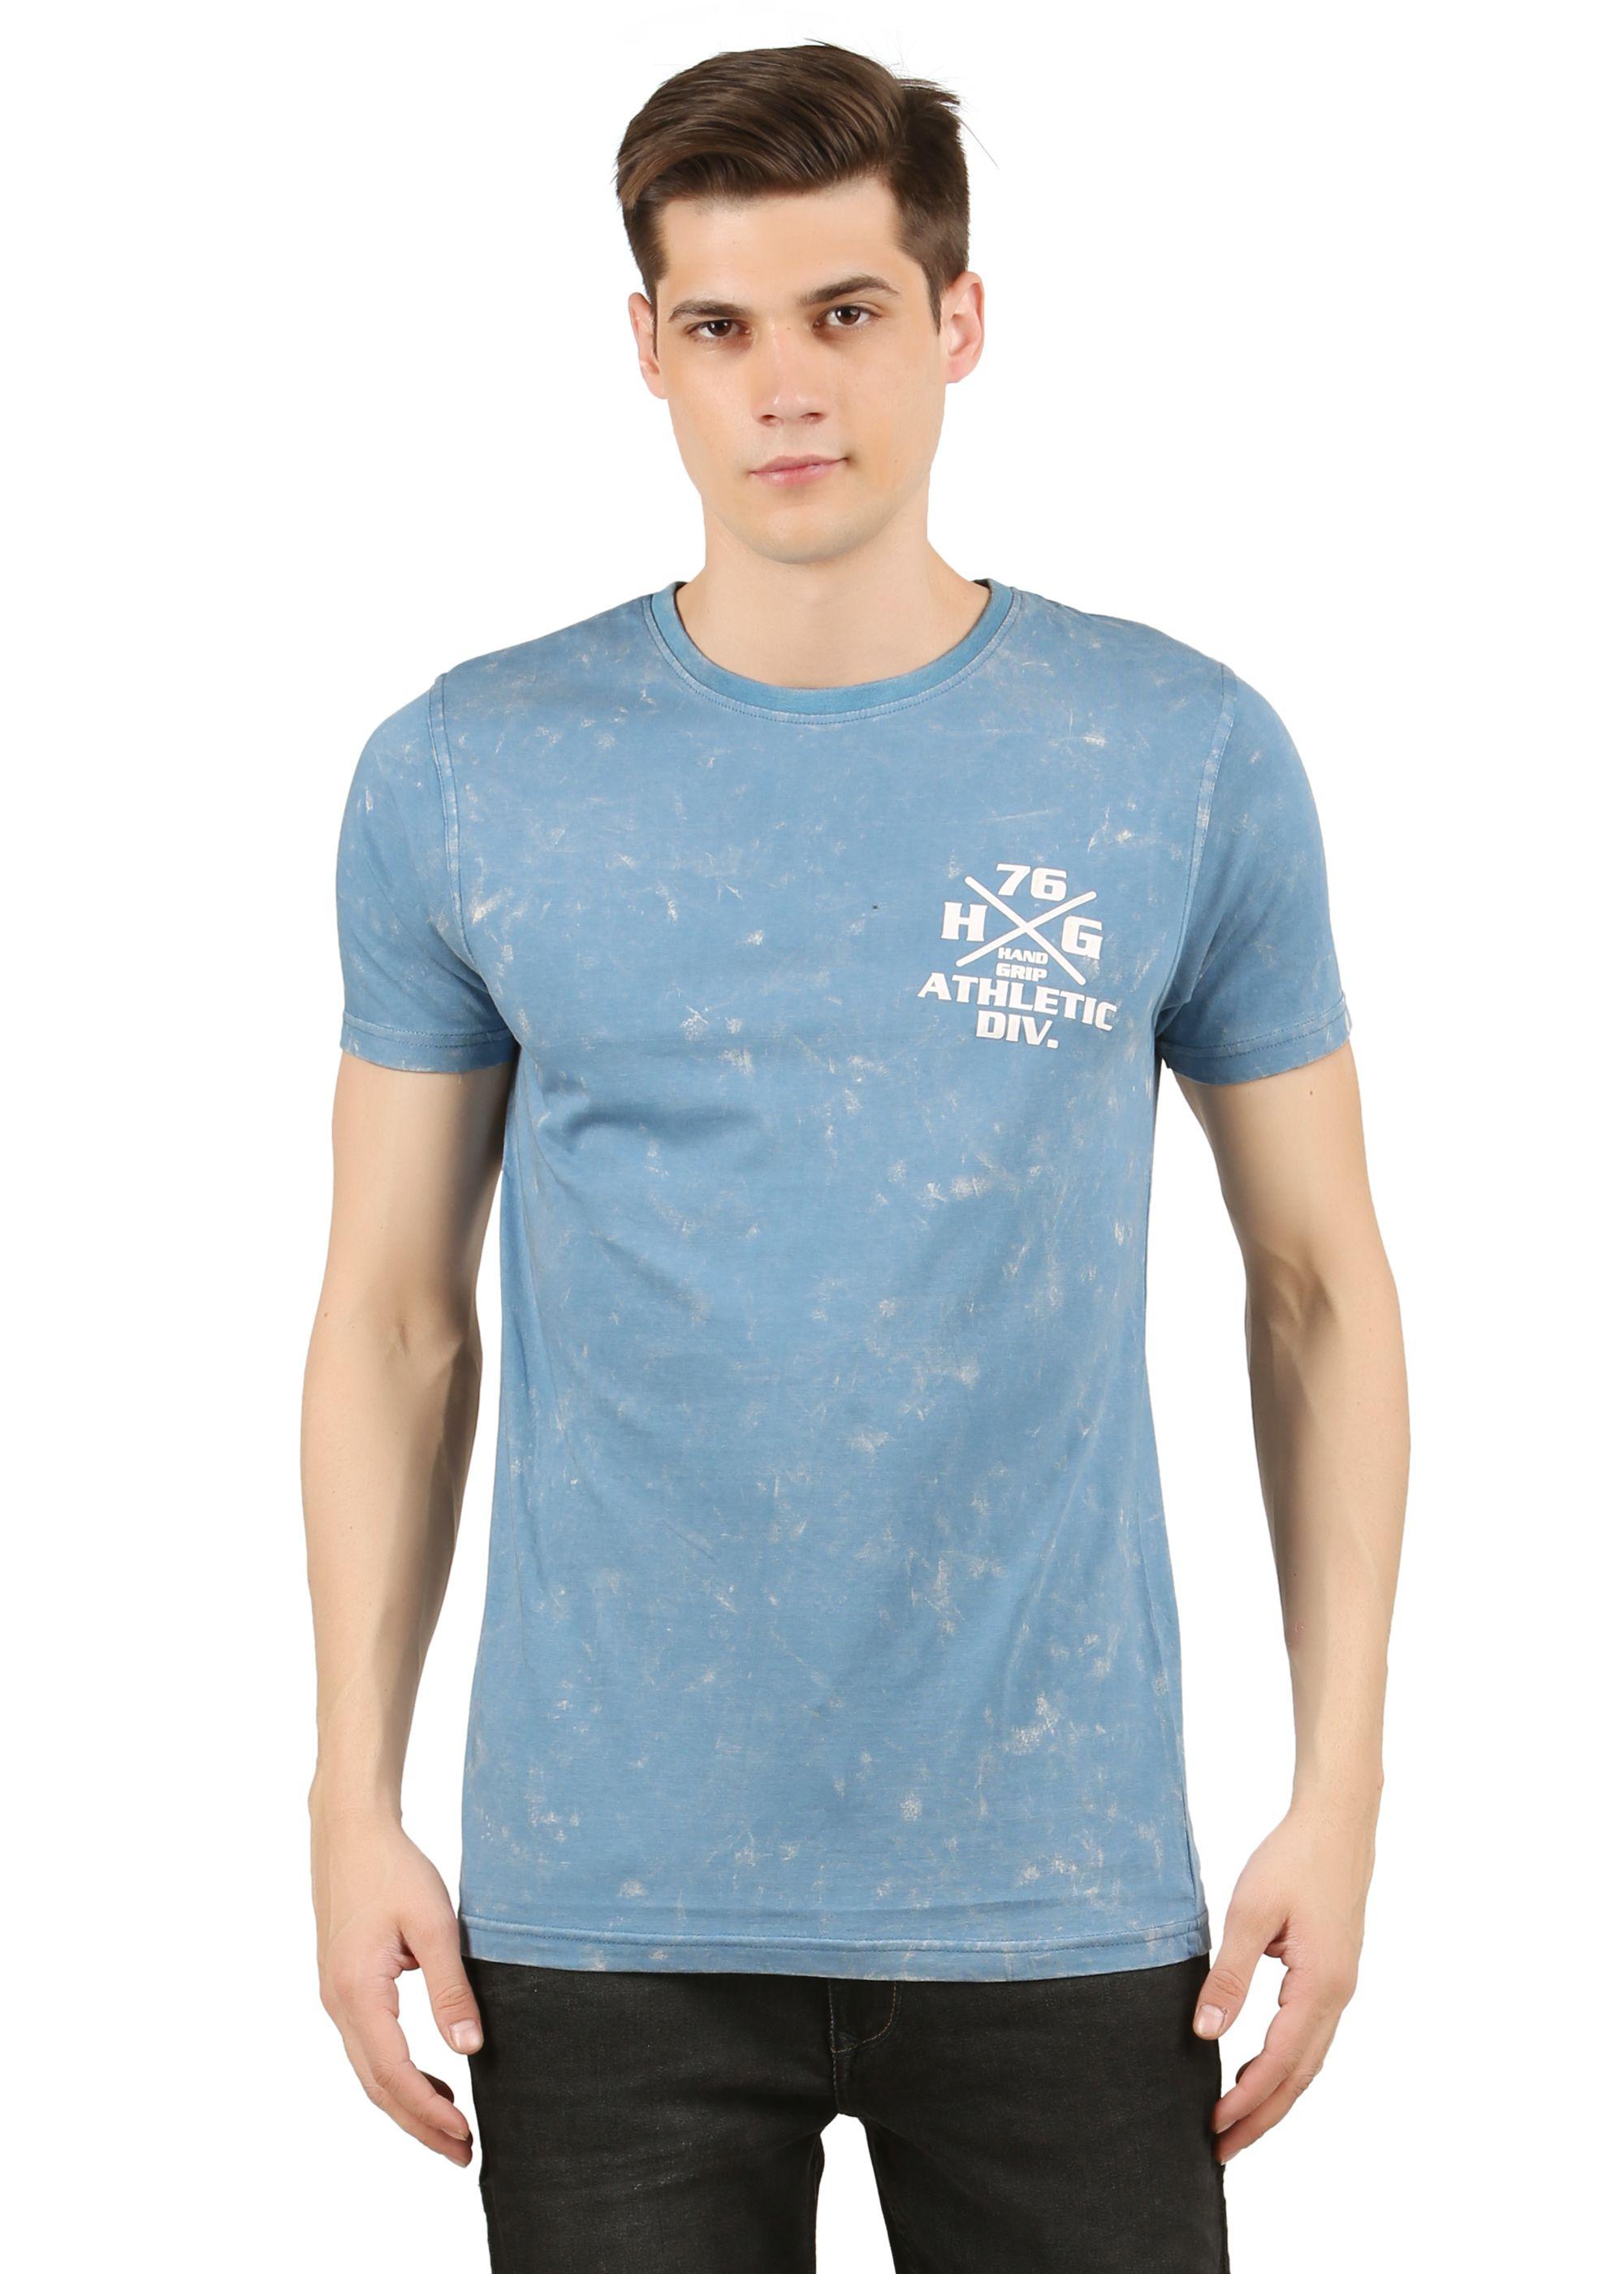 Handgrip Blue Round T-Shirt Pack of 1